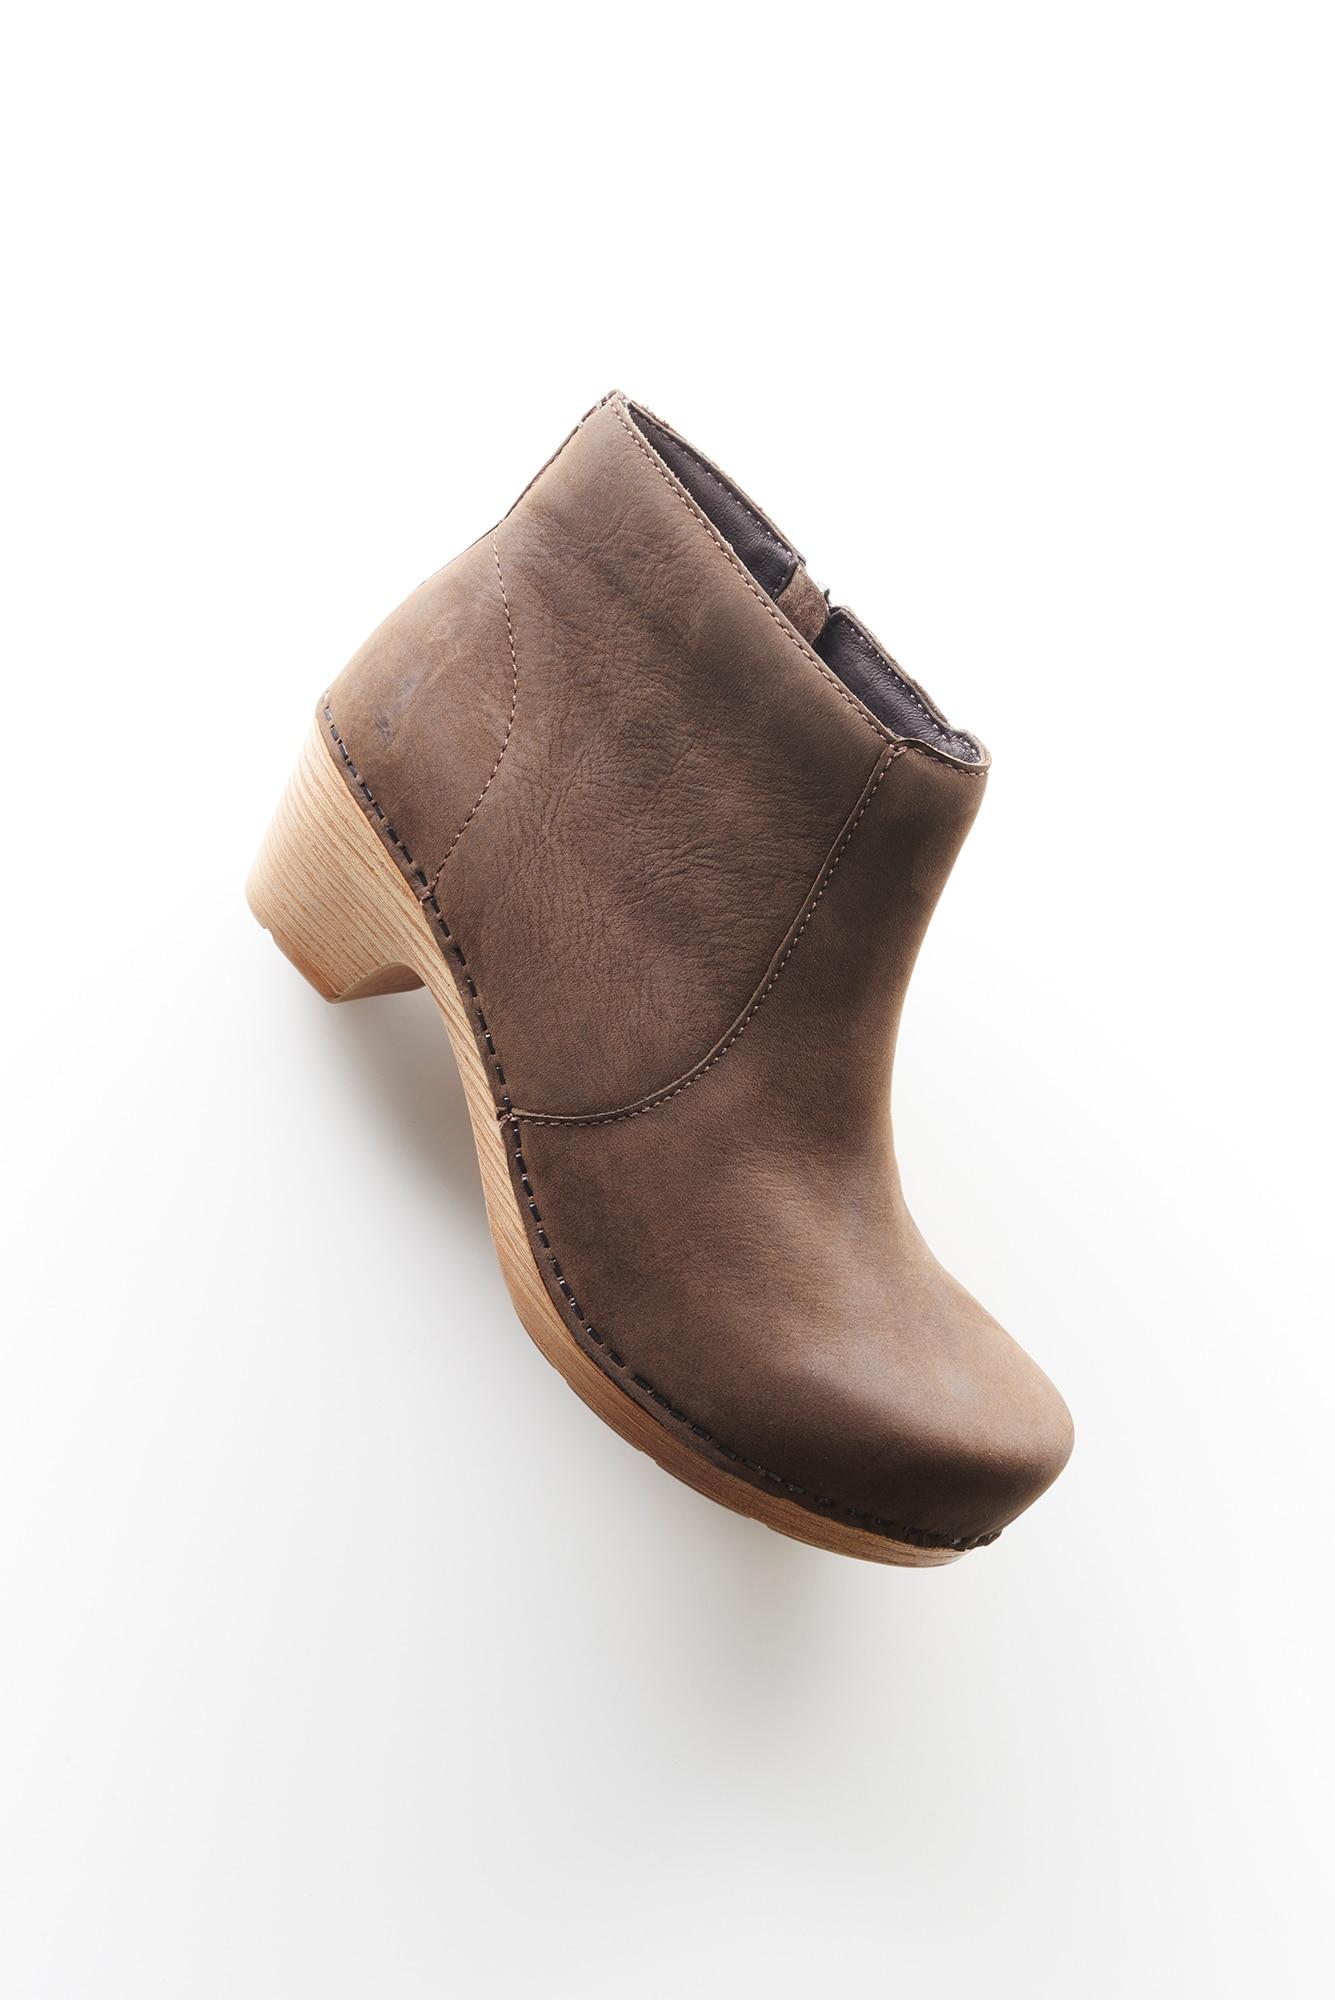 Dansko® Maria booties